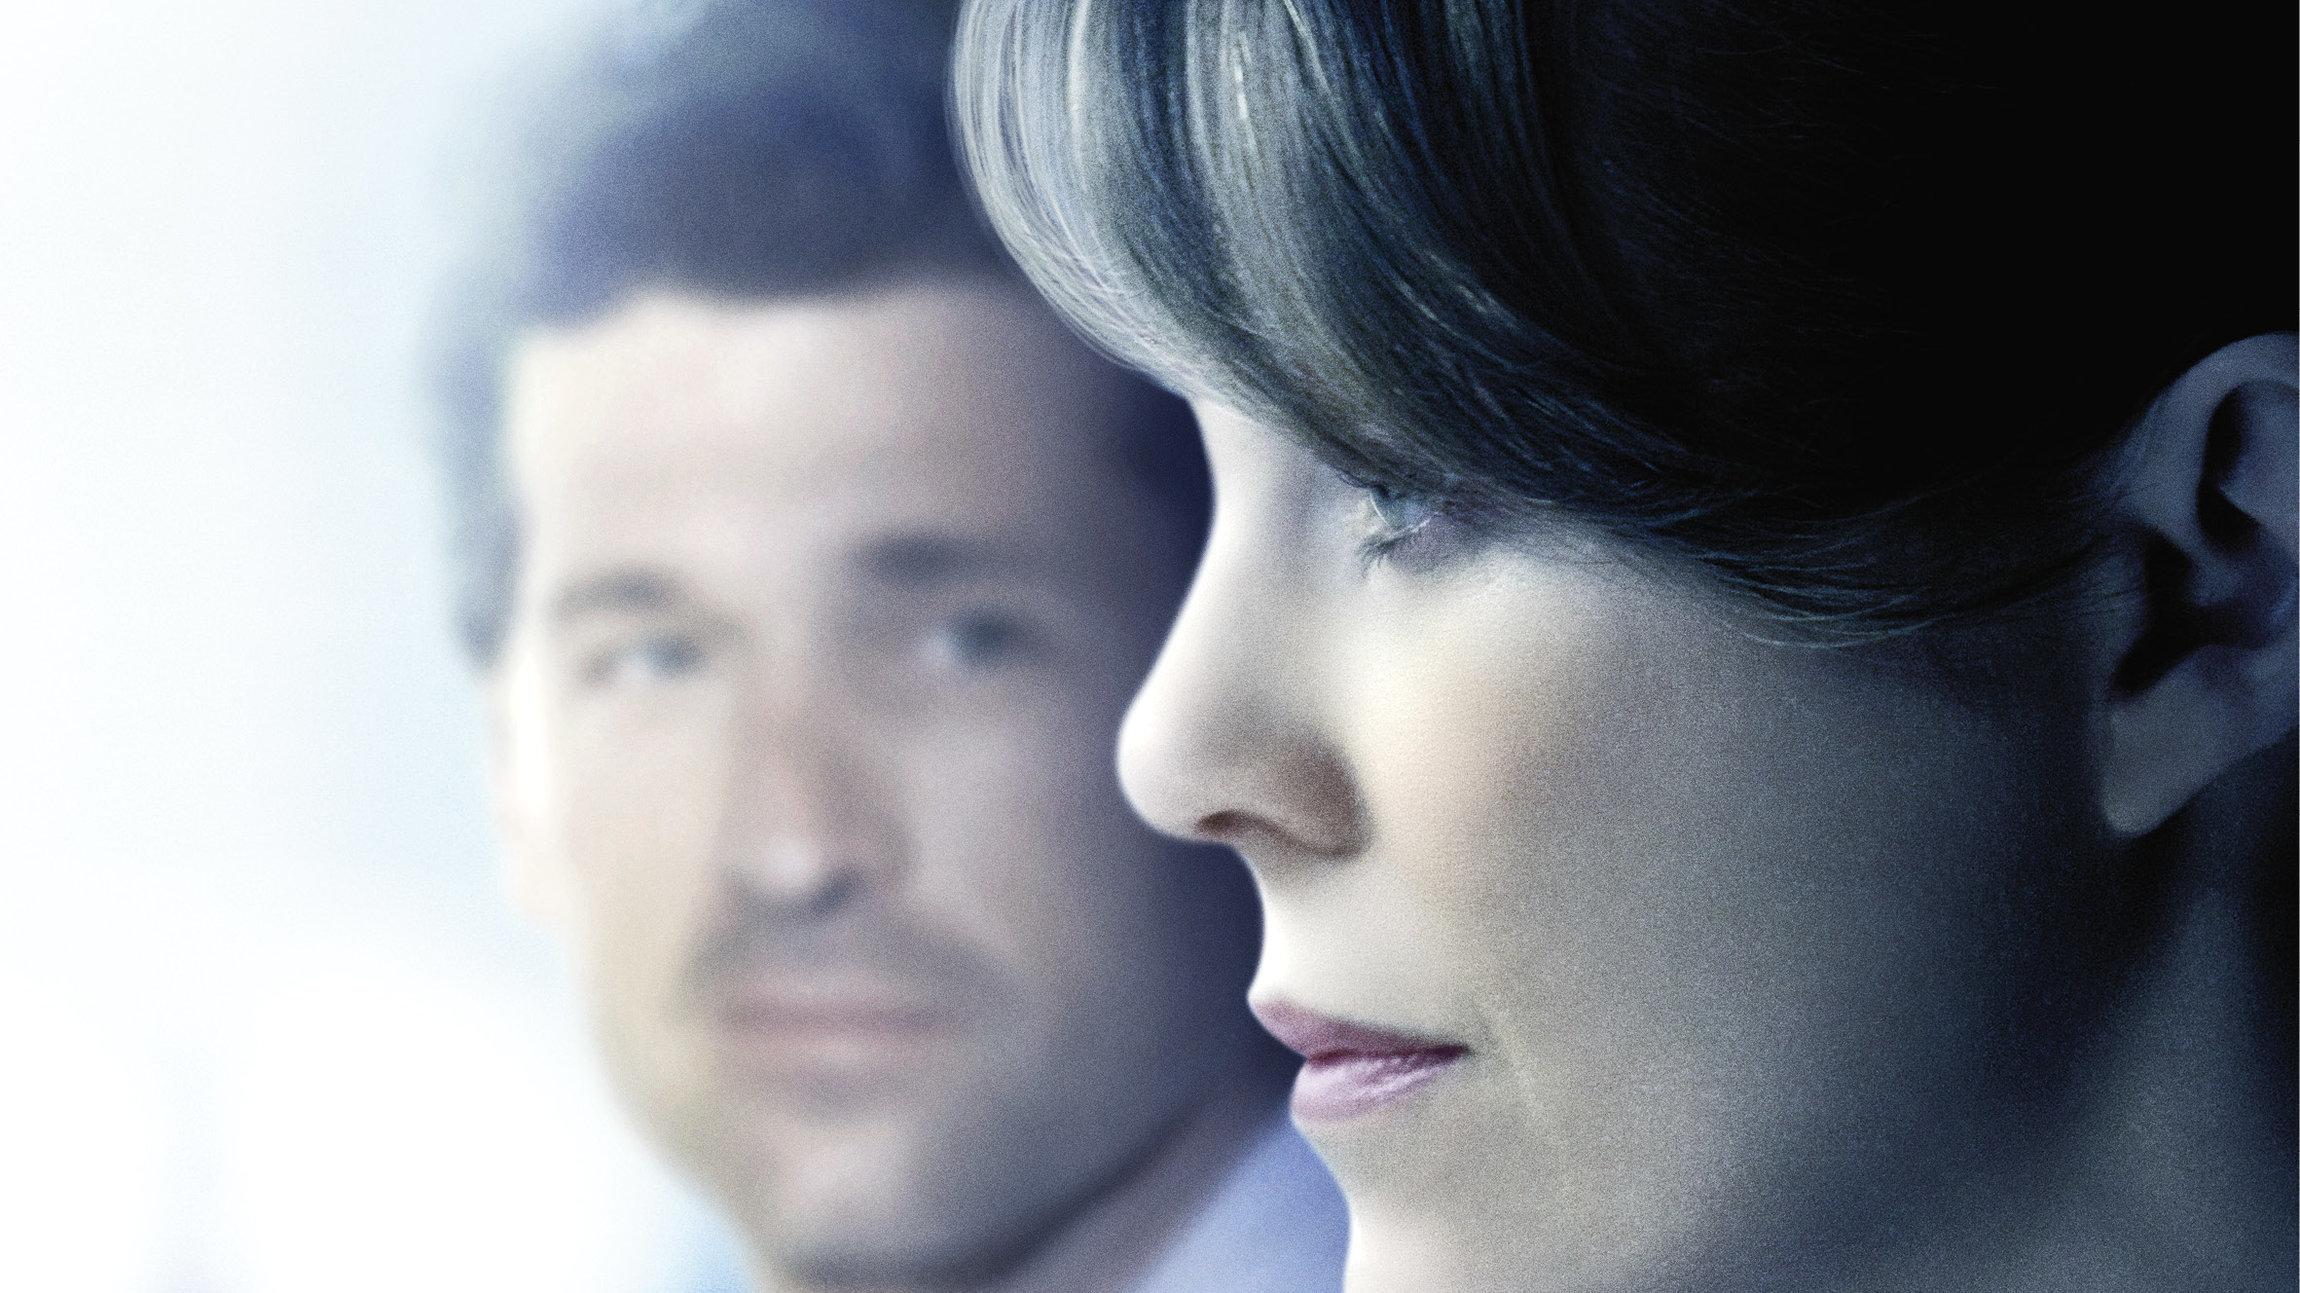 Grey's Anatomy HD Wallpaper   Background Image   2300x1293 ...